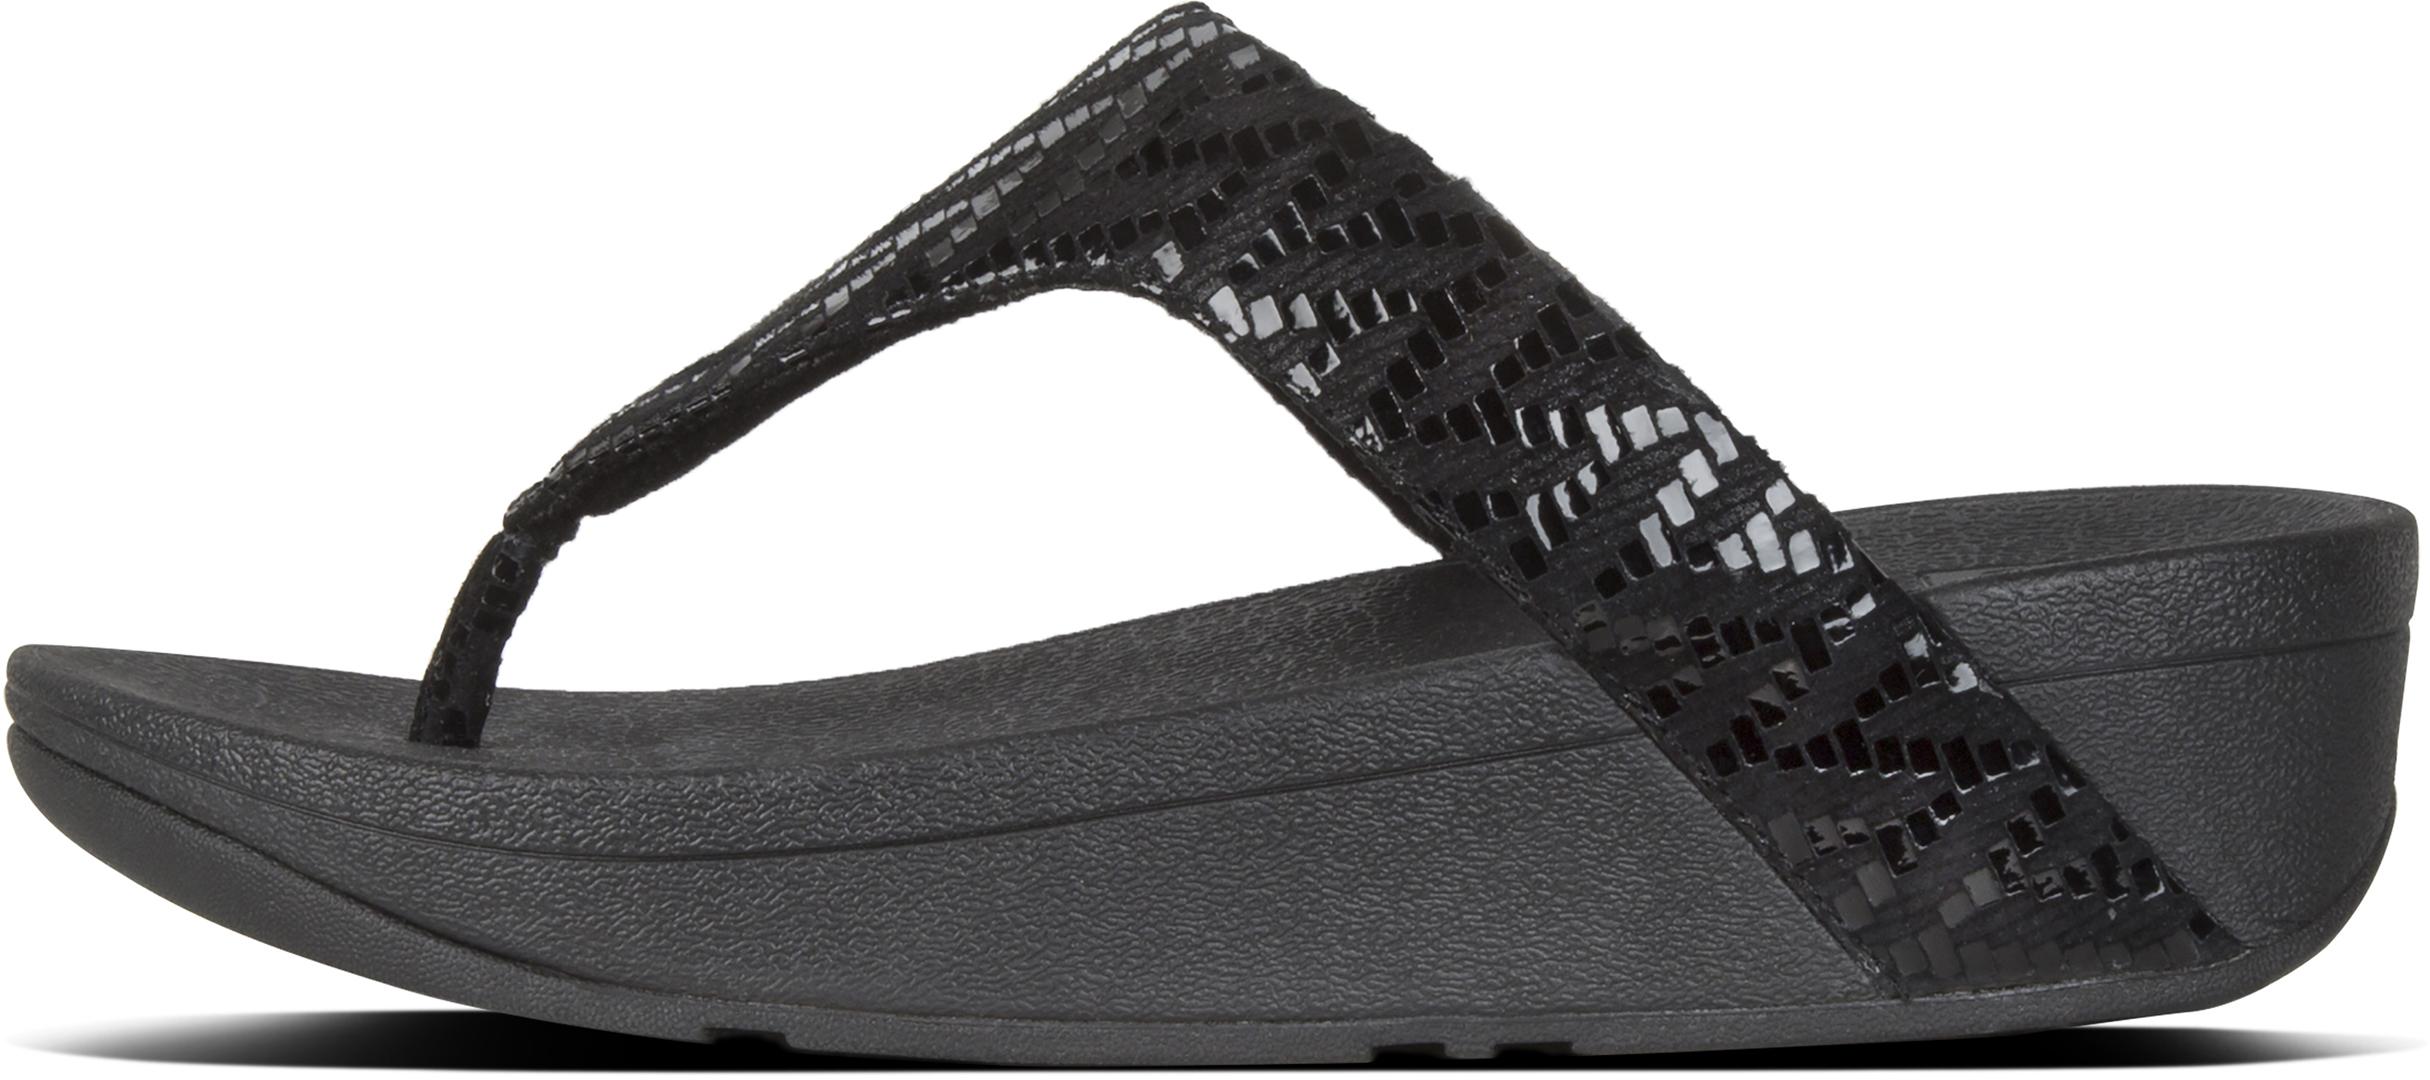 9274daa4fa8f Fitflop LOTTIE CHEVRON Sandale 2019 black